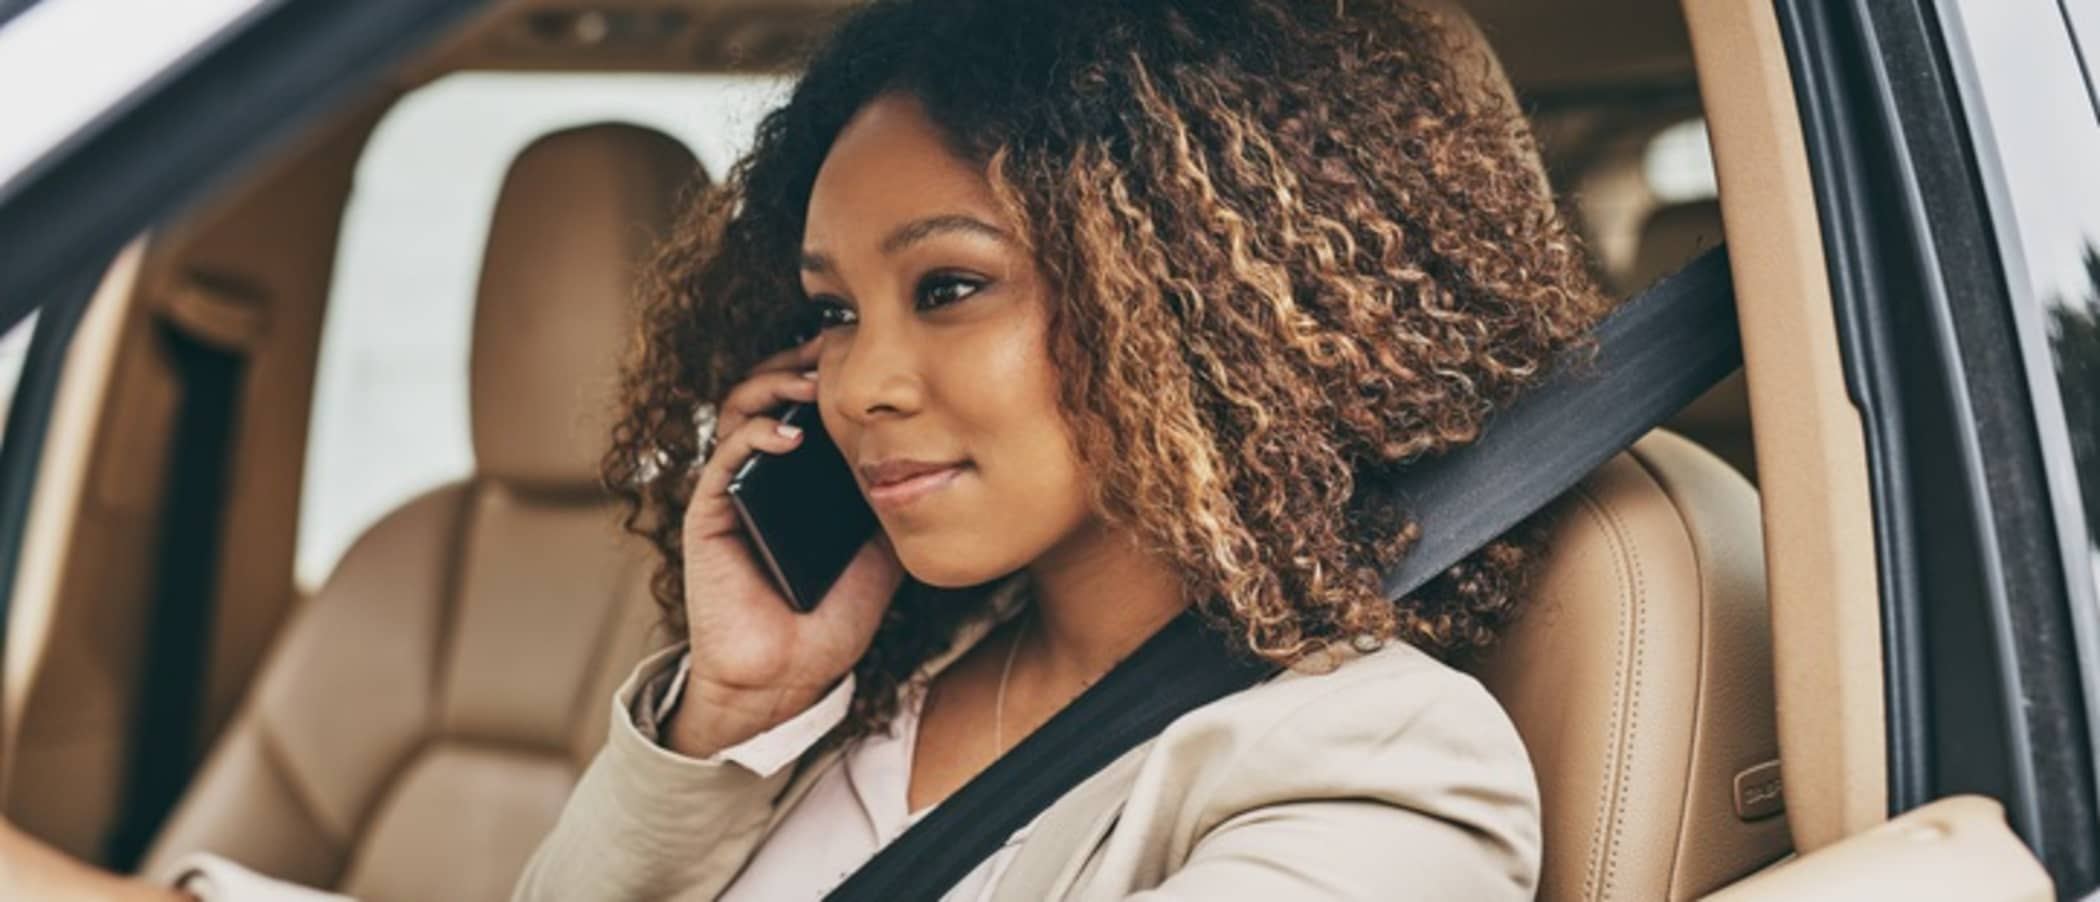 irs raises standard mileage rates for 2019